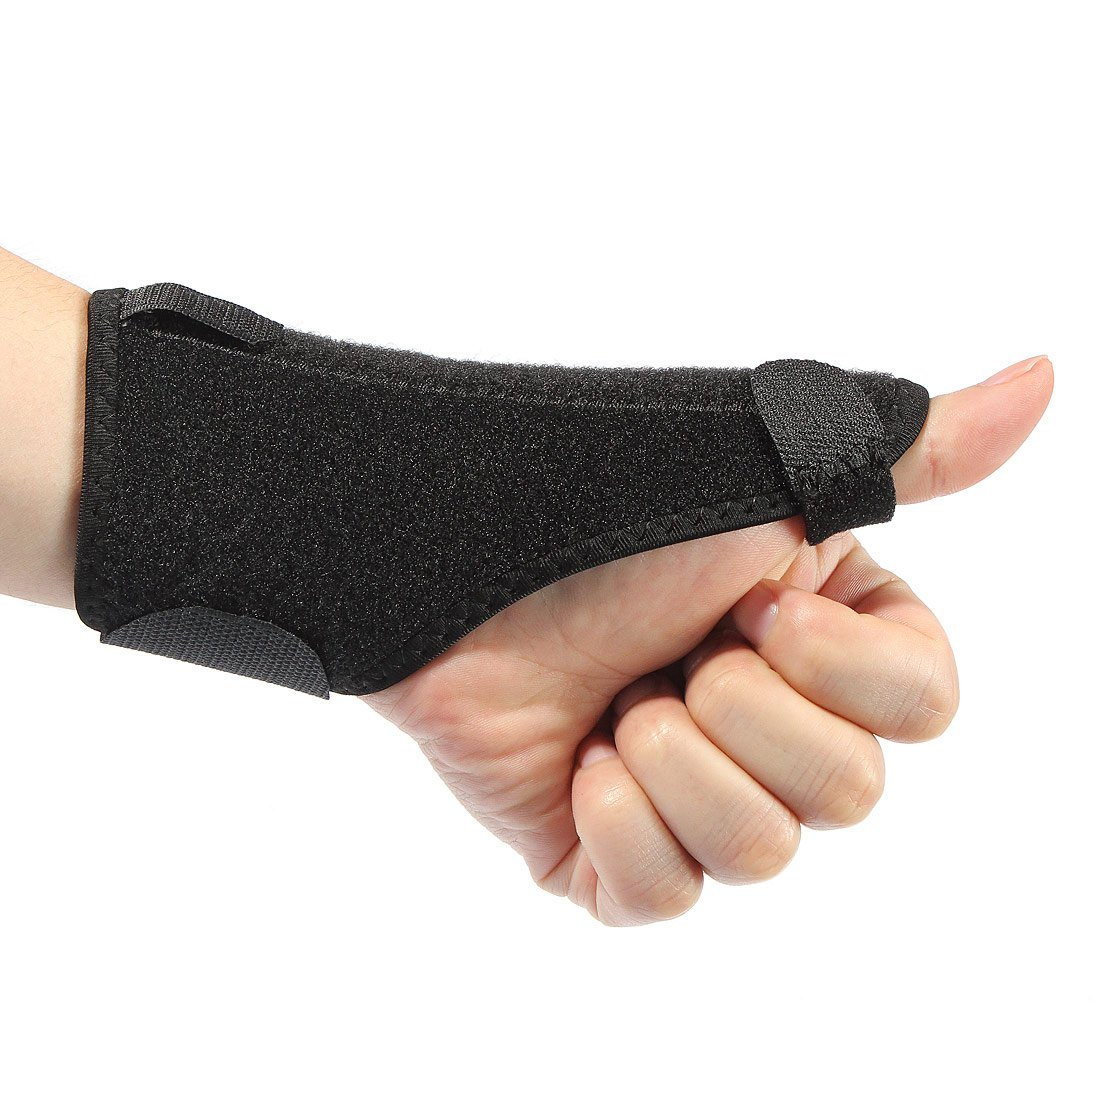 Finger Wrist Support Unisex Sports Clothing Gloves